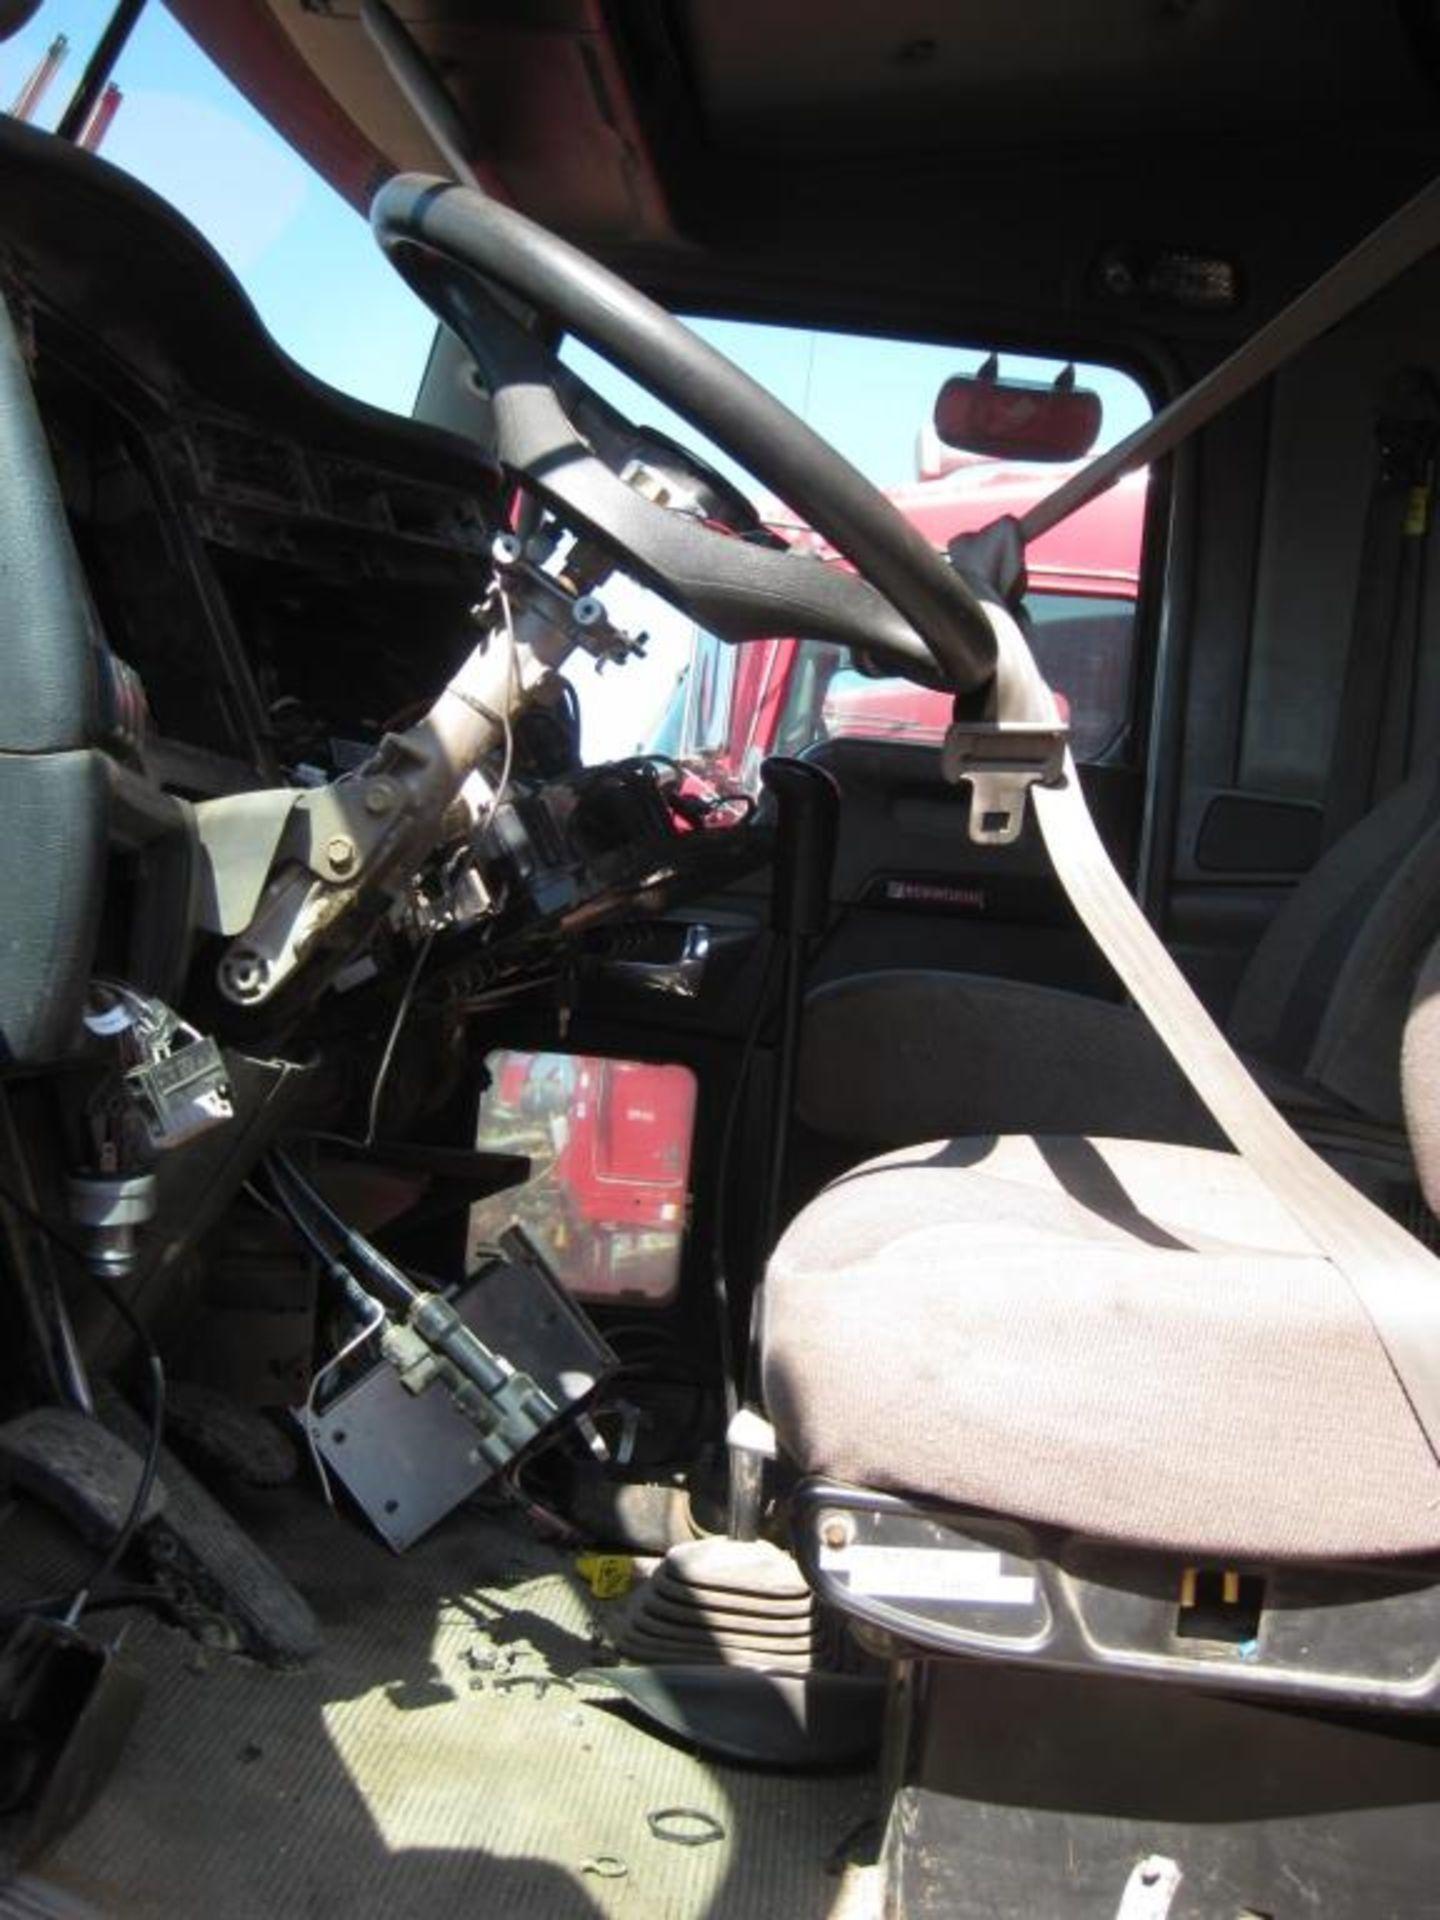 Kenworth Truck - Image 11 of 22